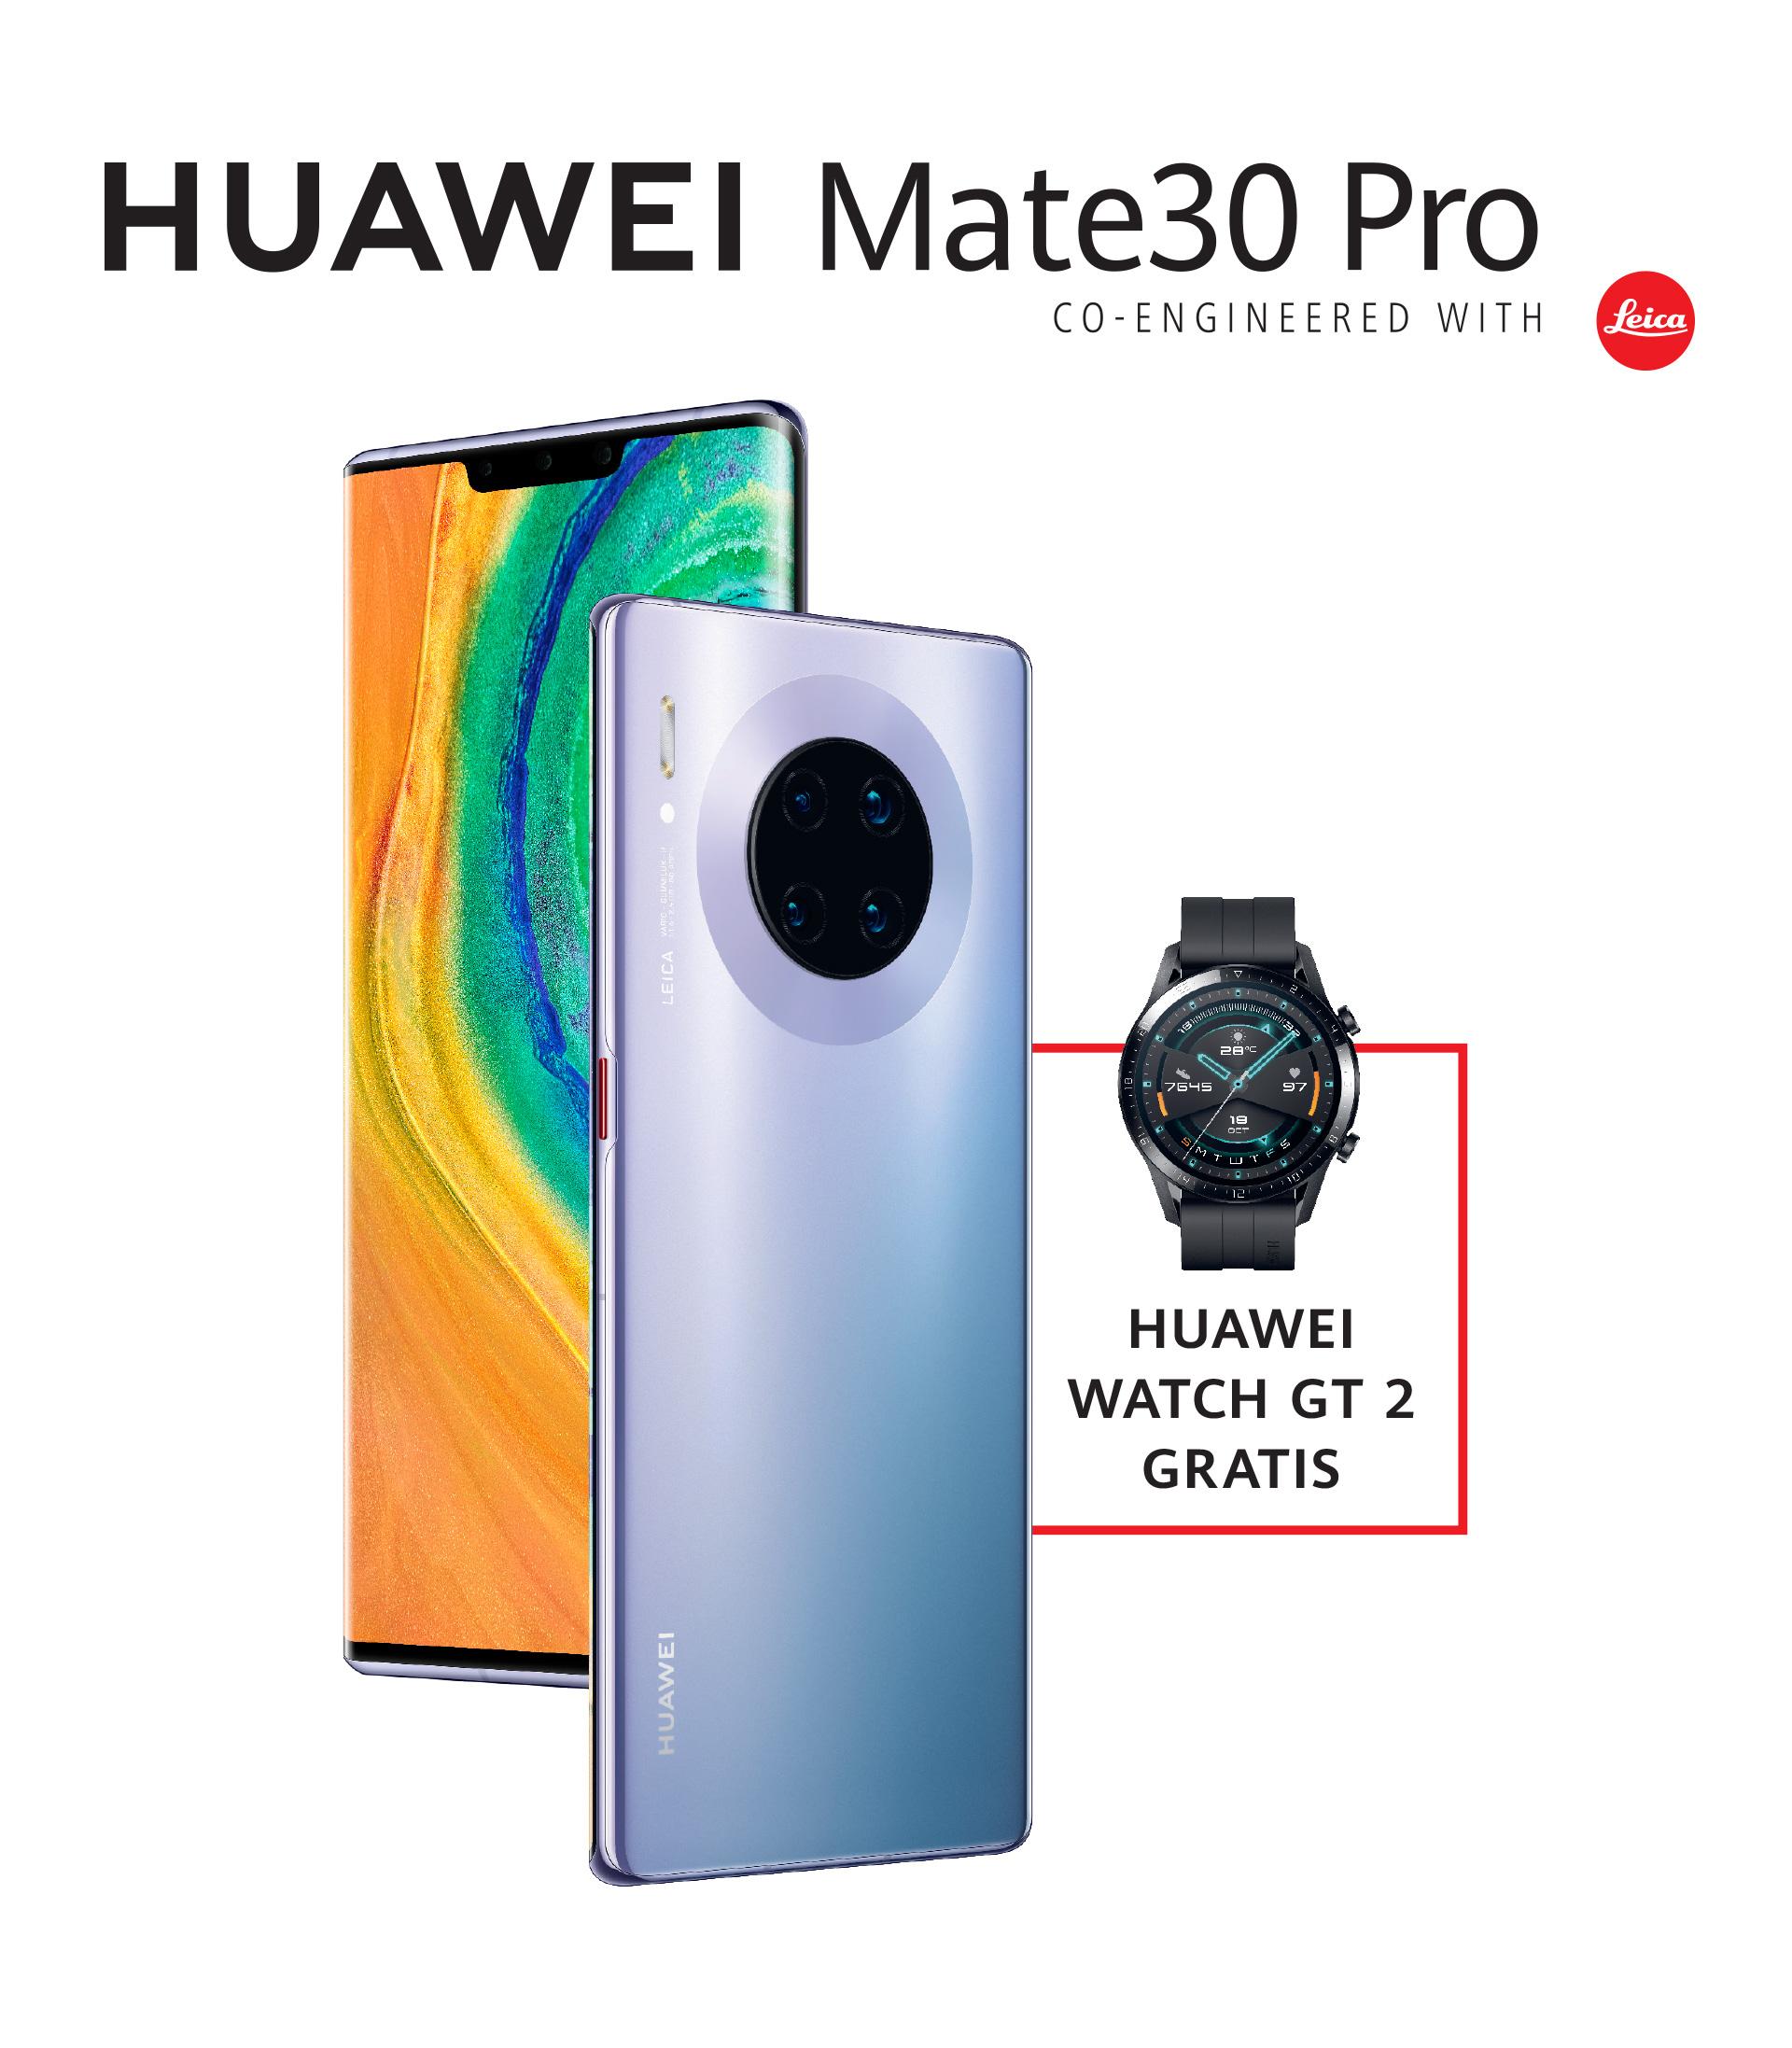 HUAWEI Mate30 Pro Promotion Bundle